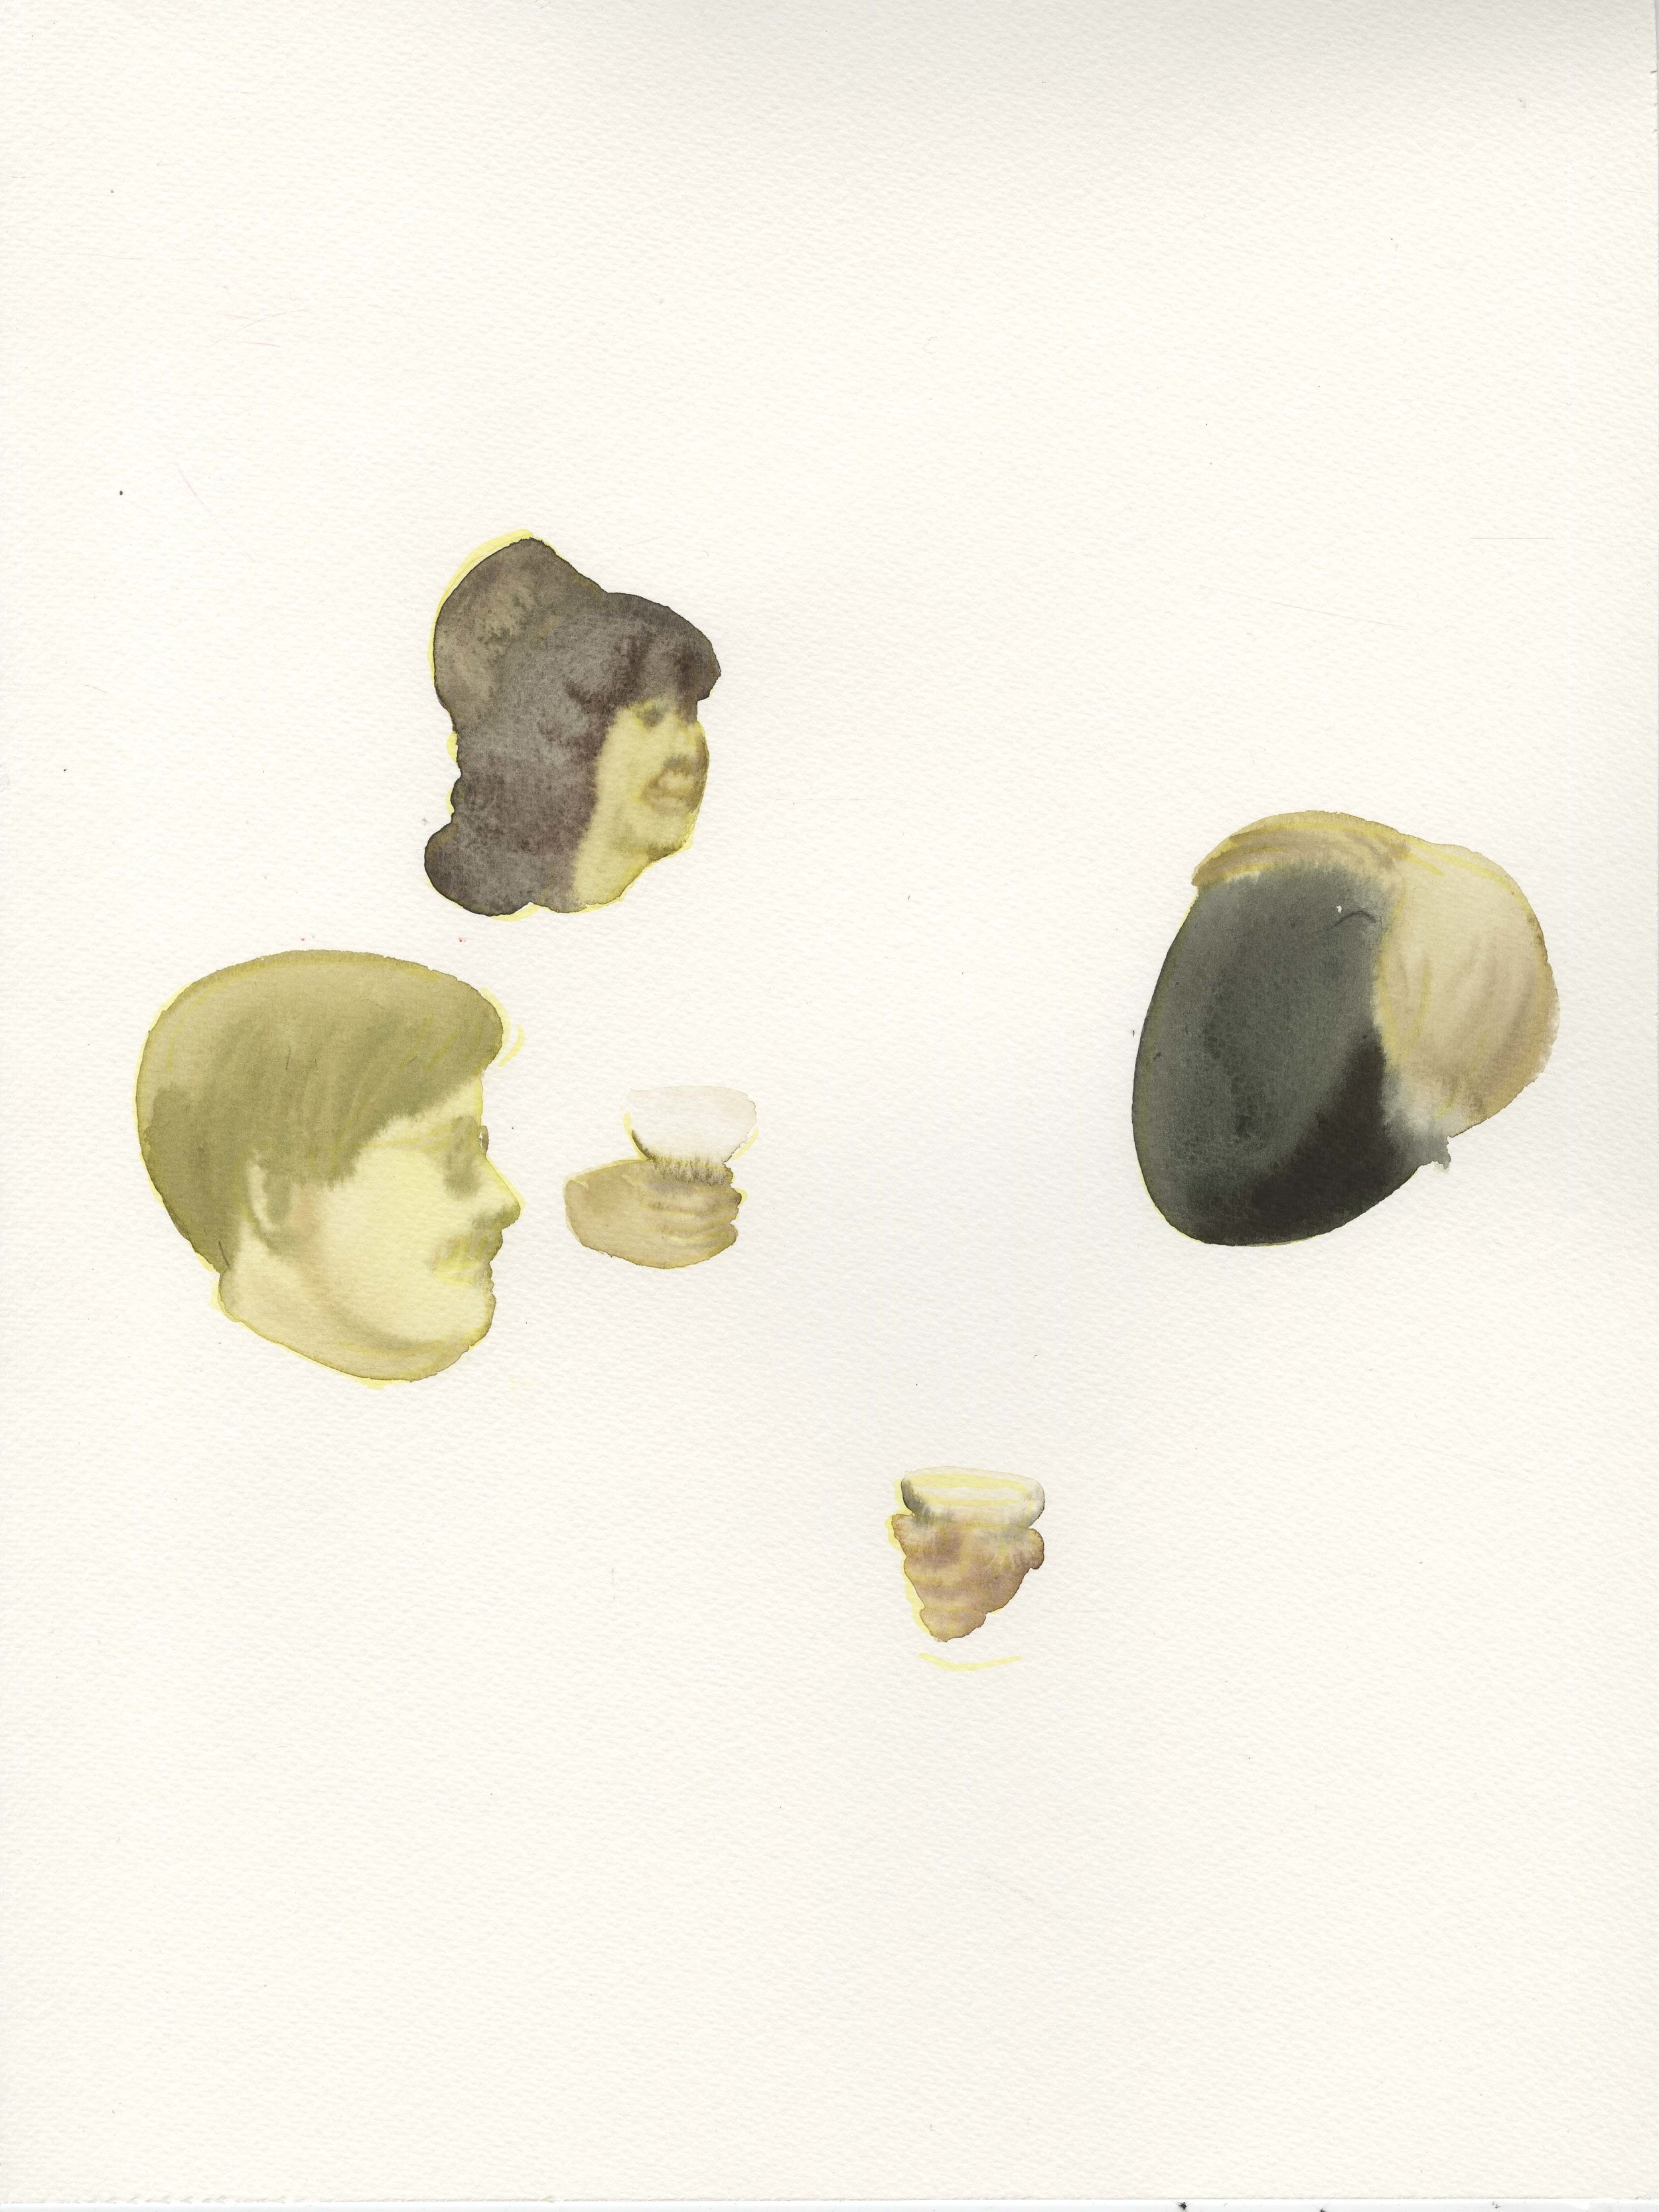 "Dark Heart of the America"", 2014, Watercolor on Paper 纸上⽔水彩 16.1 x 12 in."